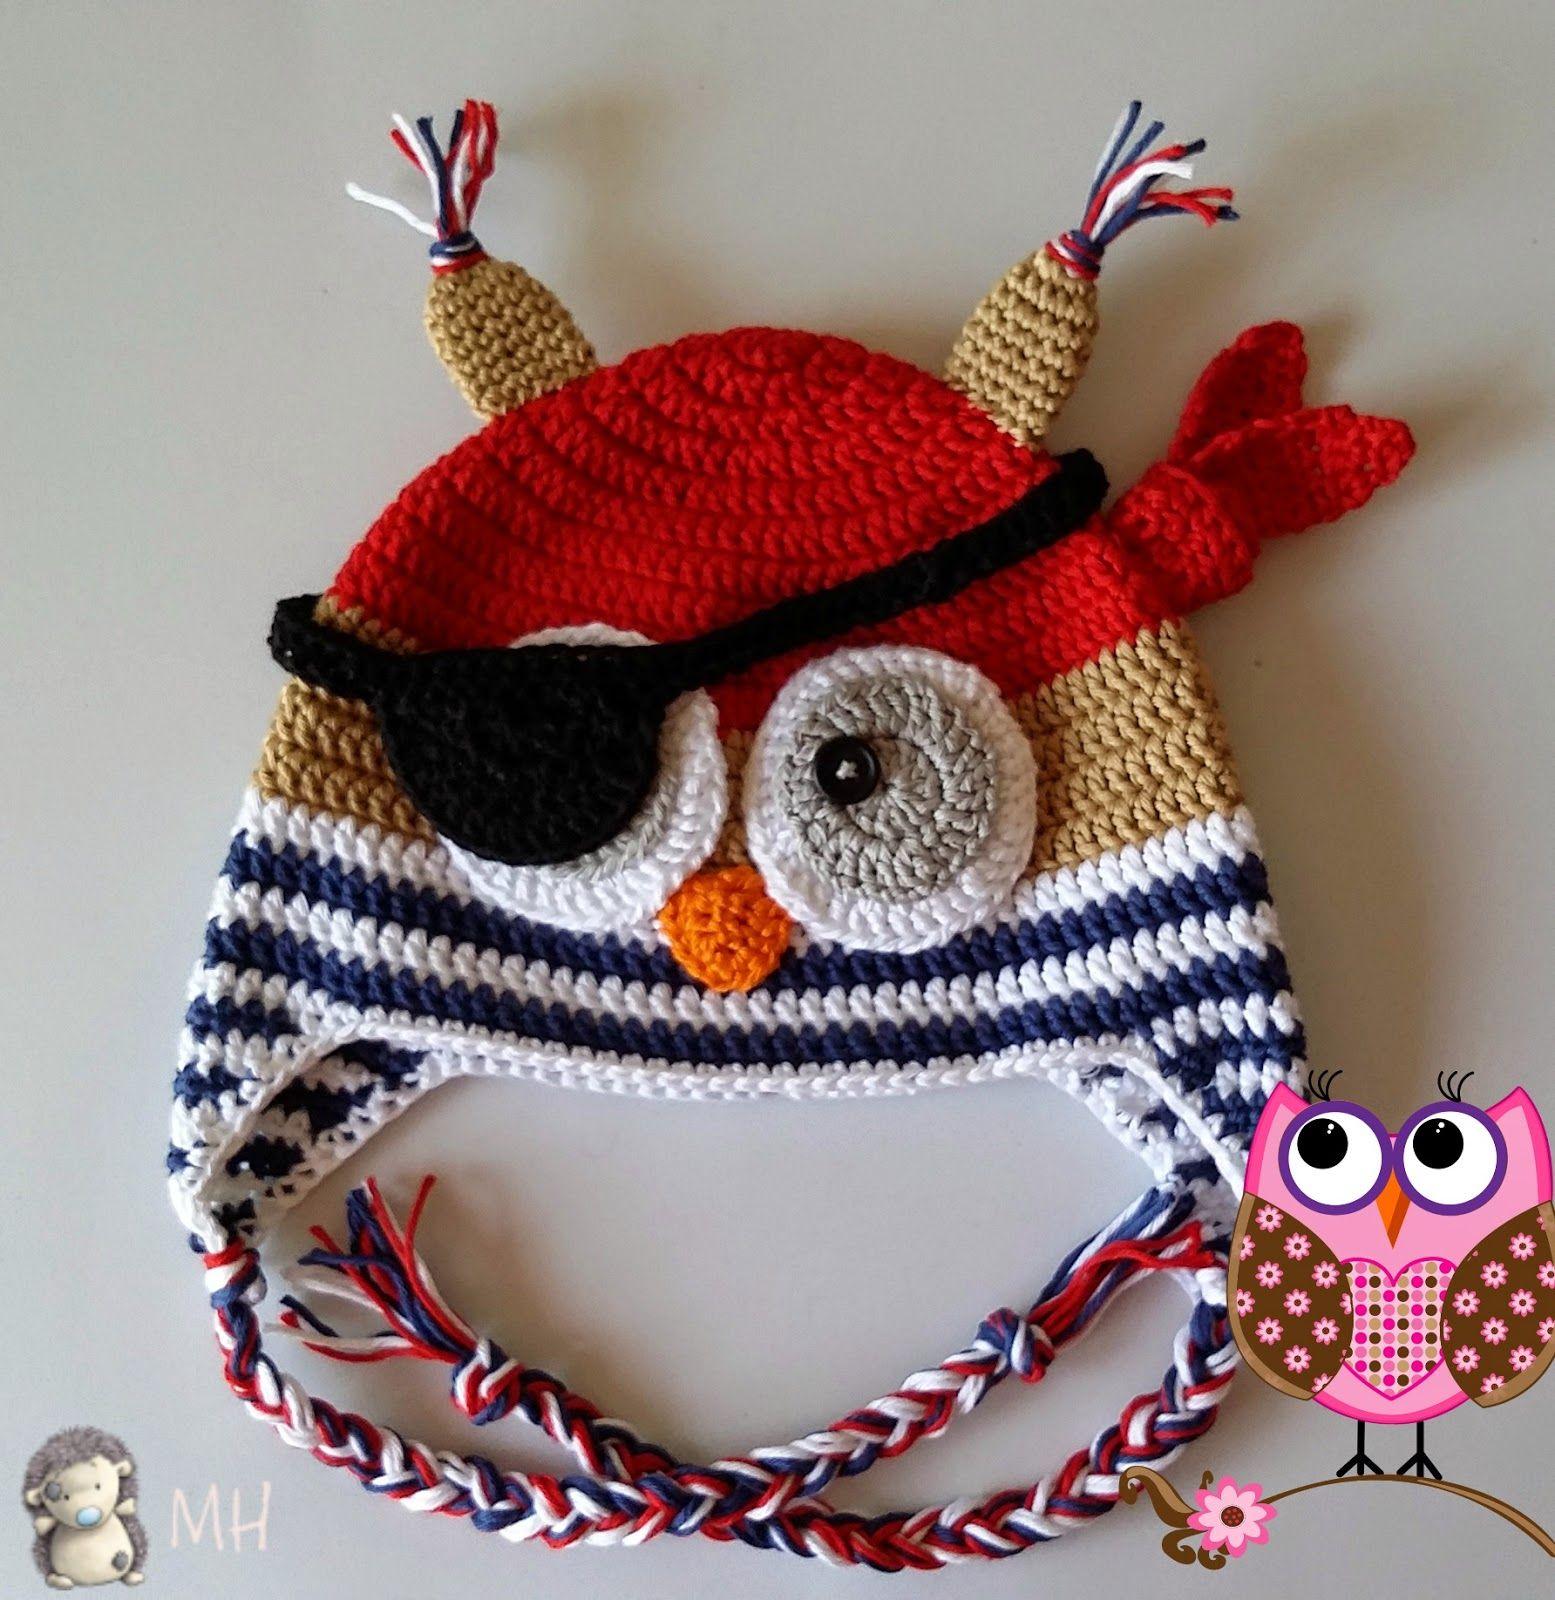 Gorrito Búho Pirata   Caps and Hats for Baby-Crochet   Pinterest ...